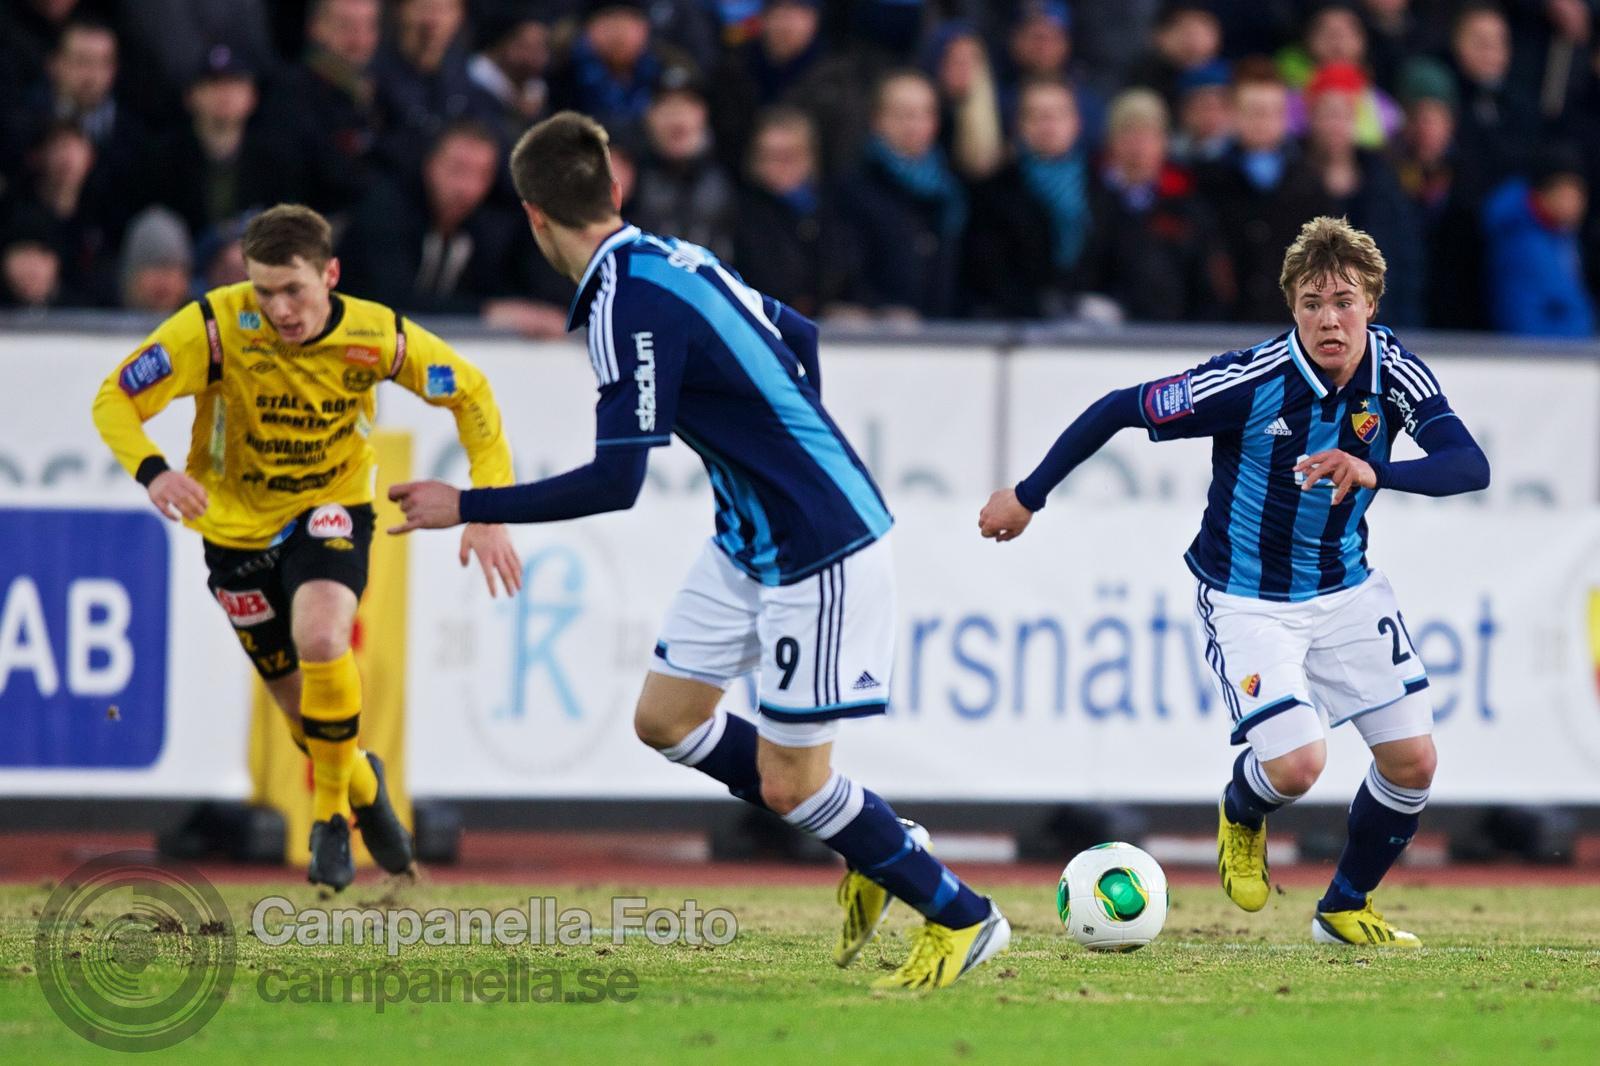 Djurgårdens IF vs Mjällby AIF - 2 of 10